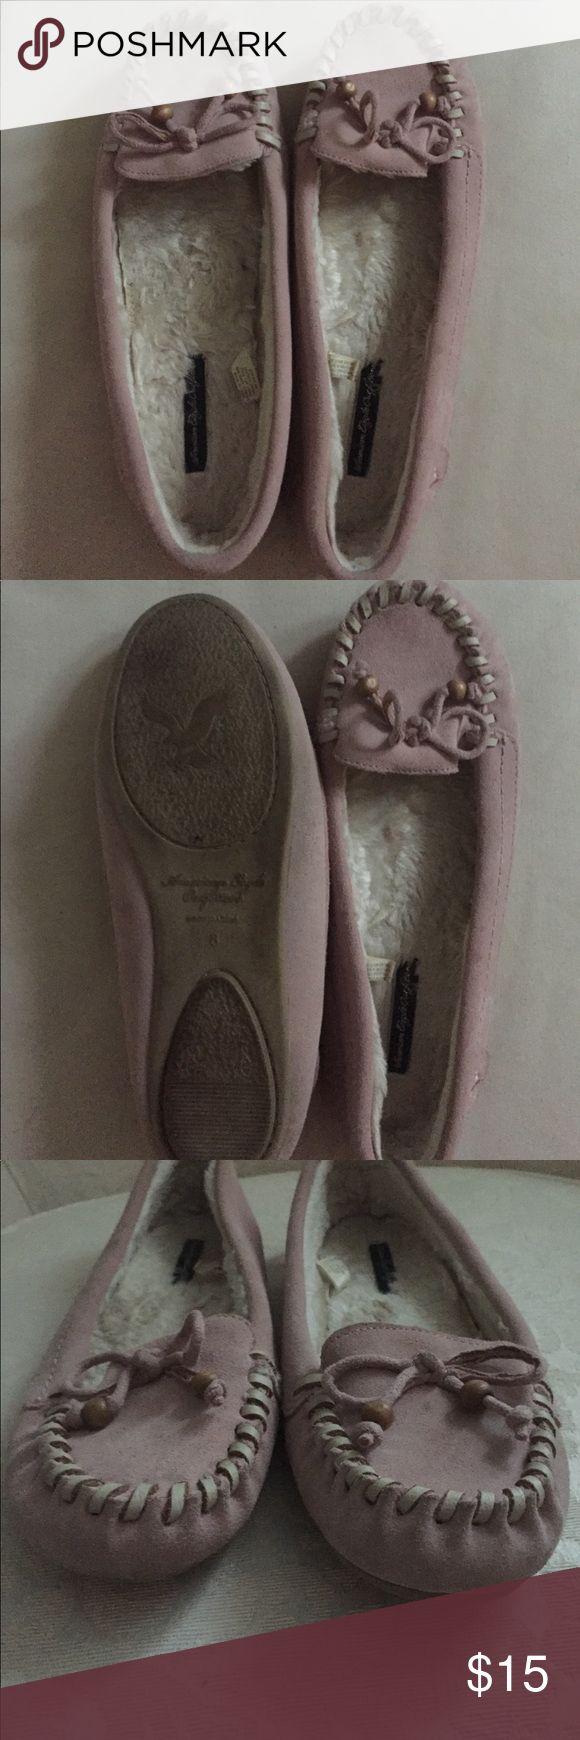 American eagle Mocs Soft pink moccasins size 8 from American eagle American Eagle Outfitters Shoes Moccasins